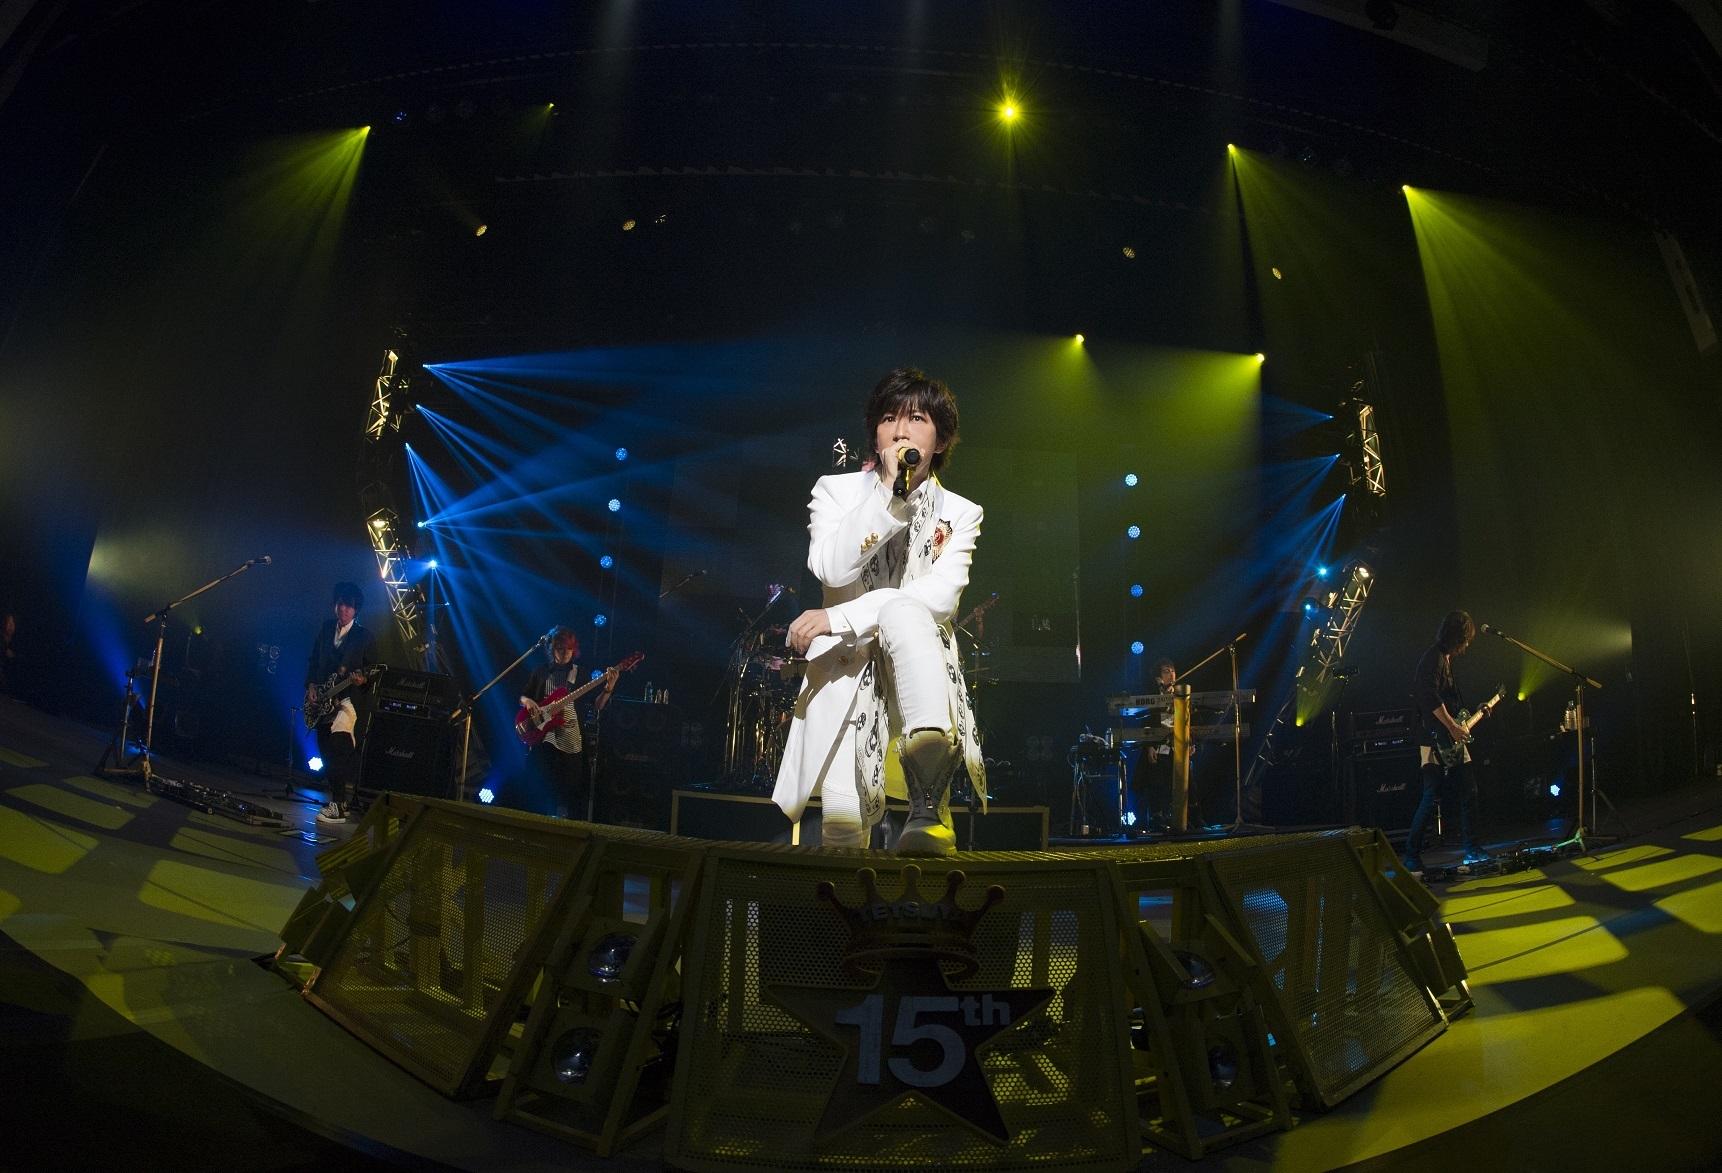 TETSUYAソロ15周年記念ライブを映像化